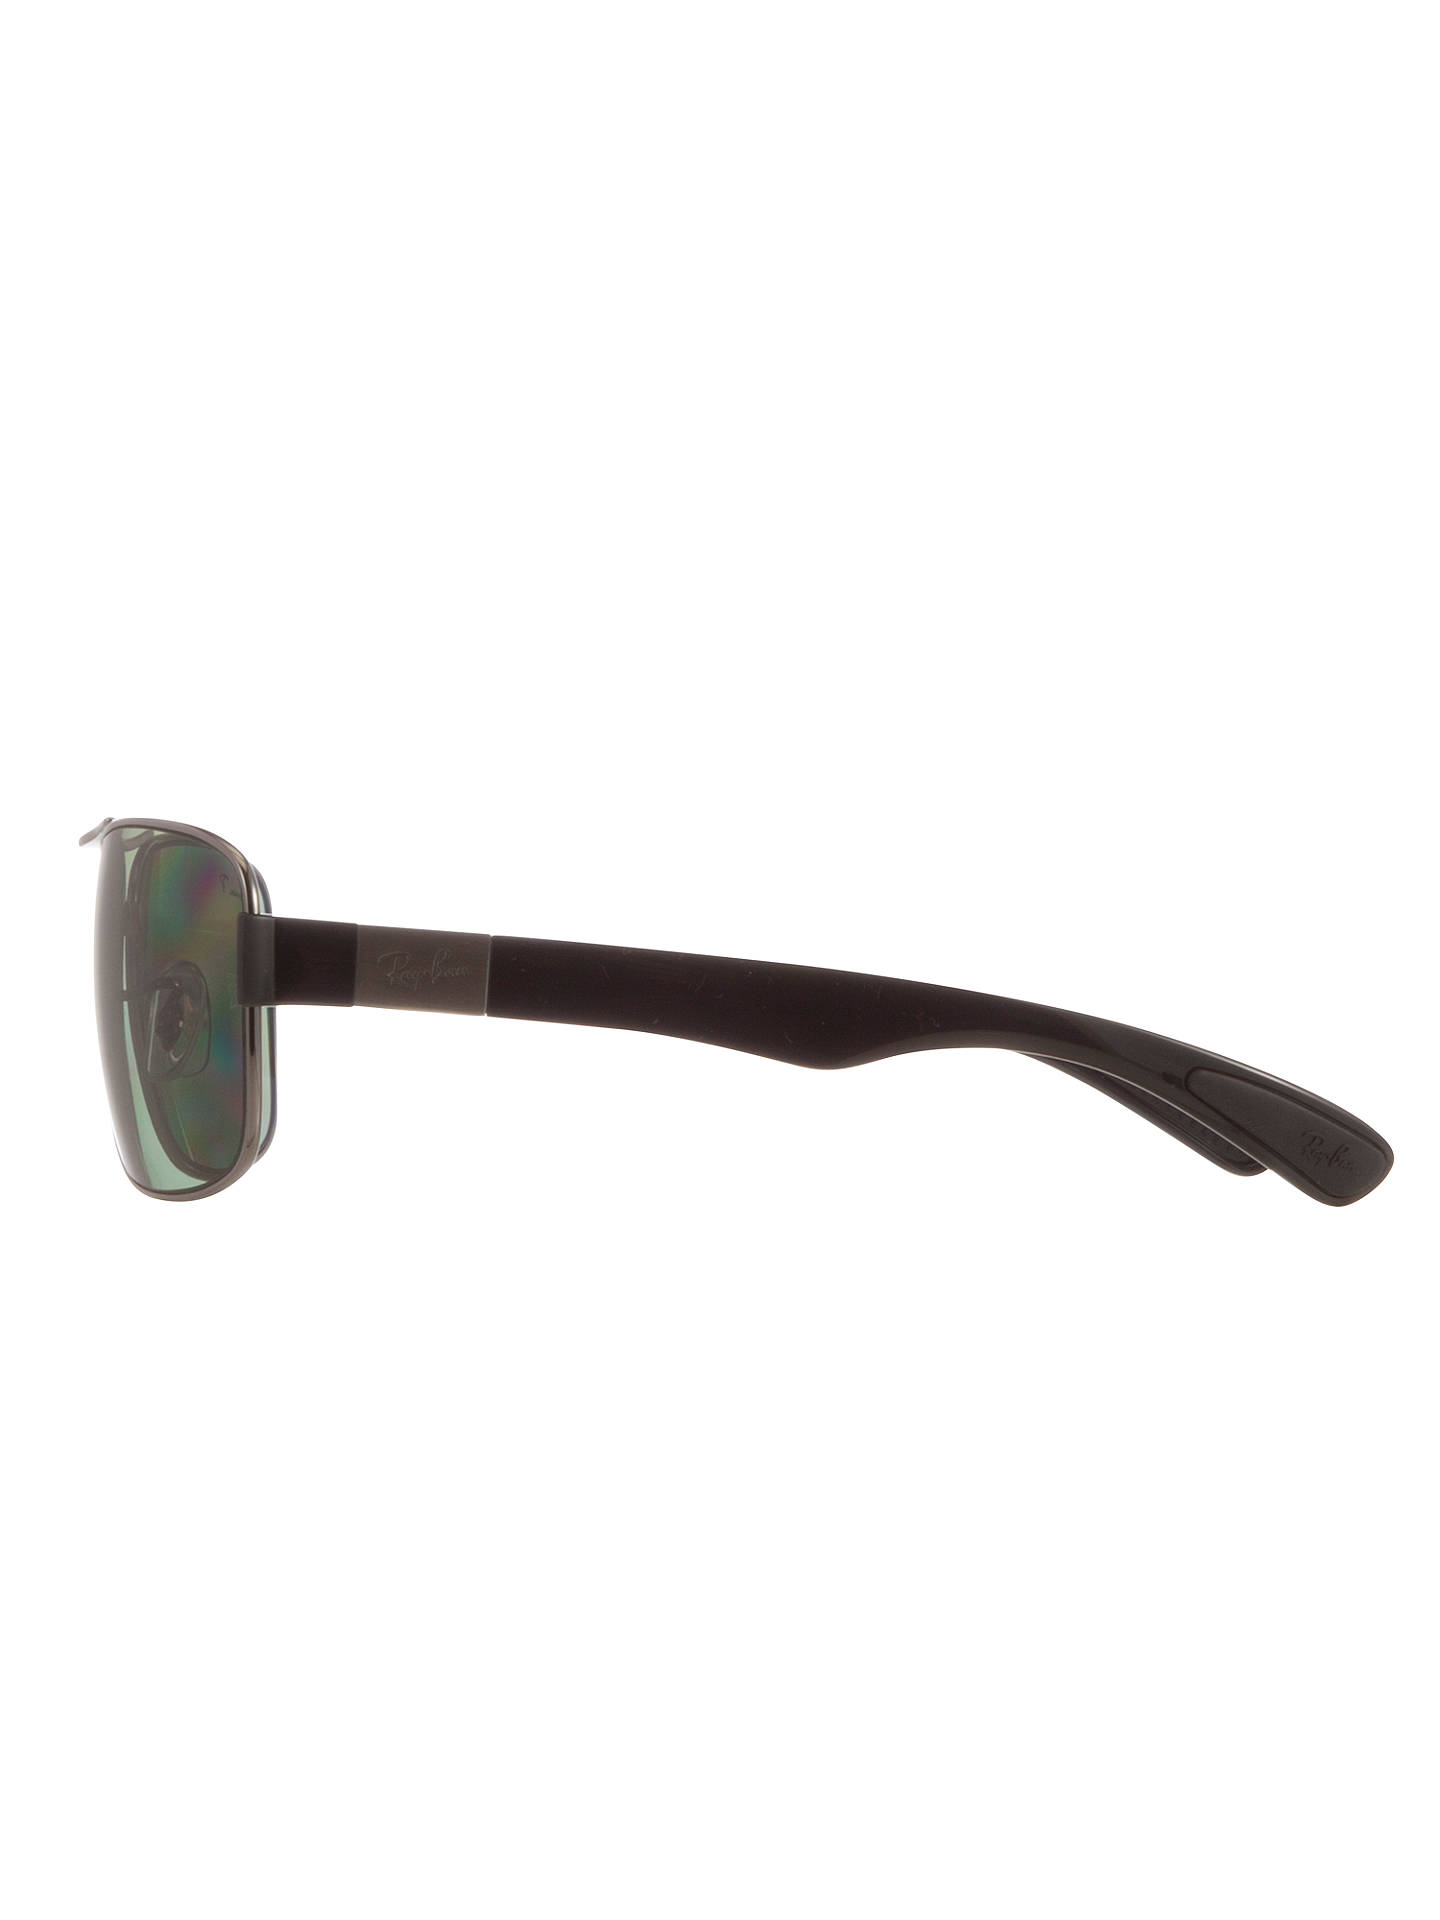 24dc60dde0 BuyRay-Ban RB3522 Square Framed Polarised Sunglasses